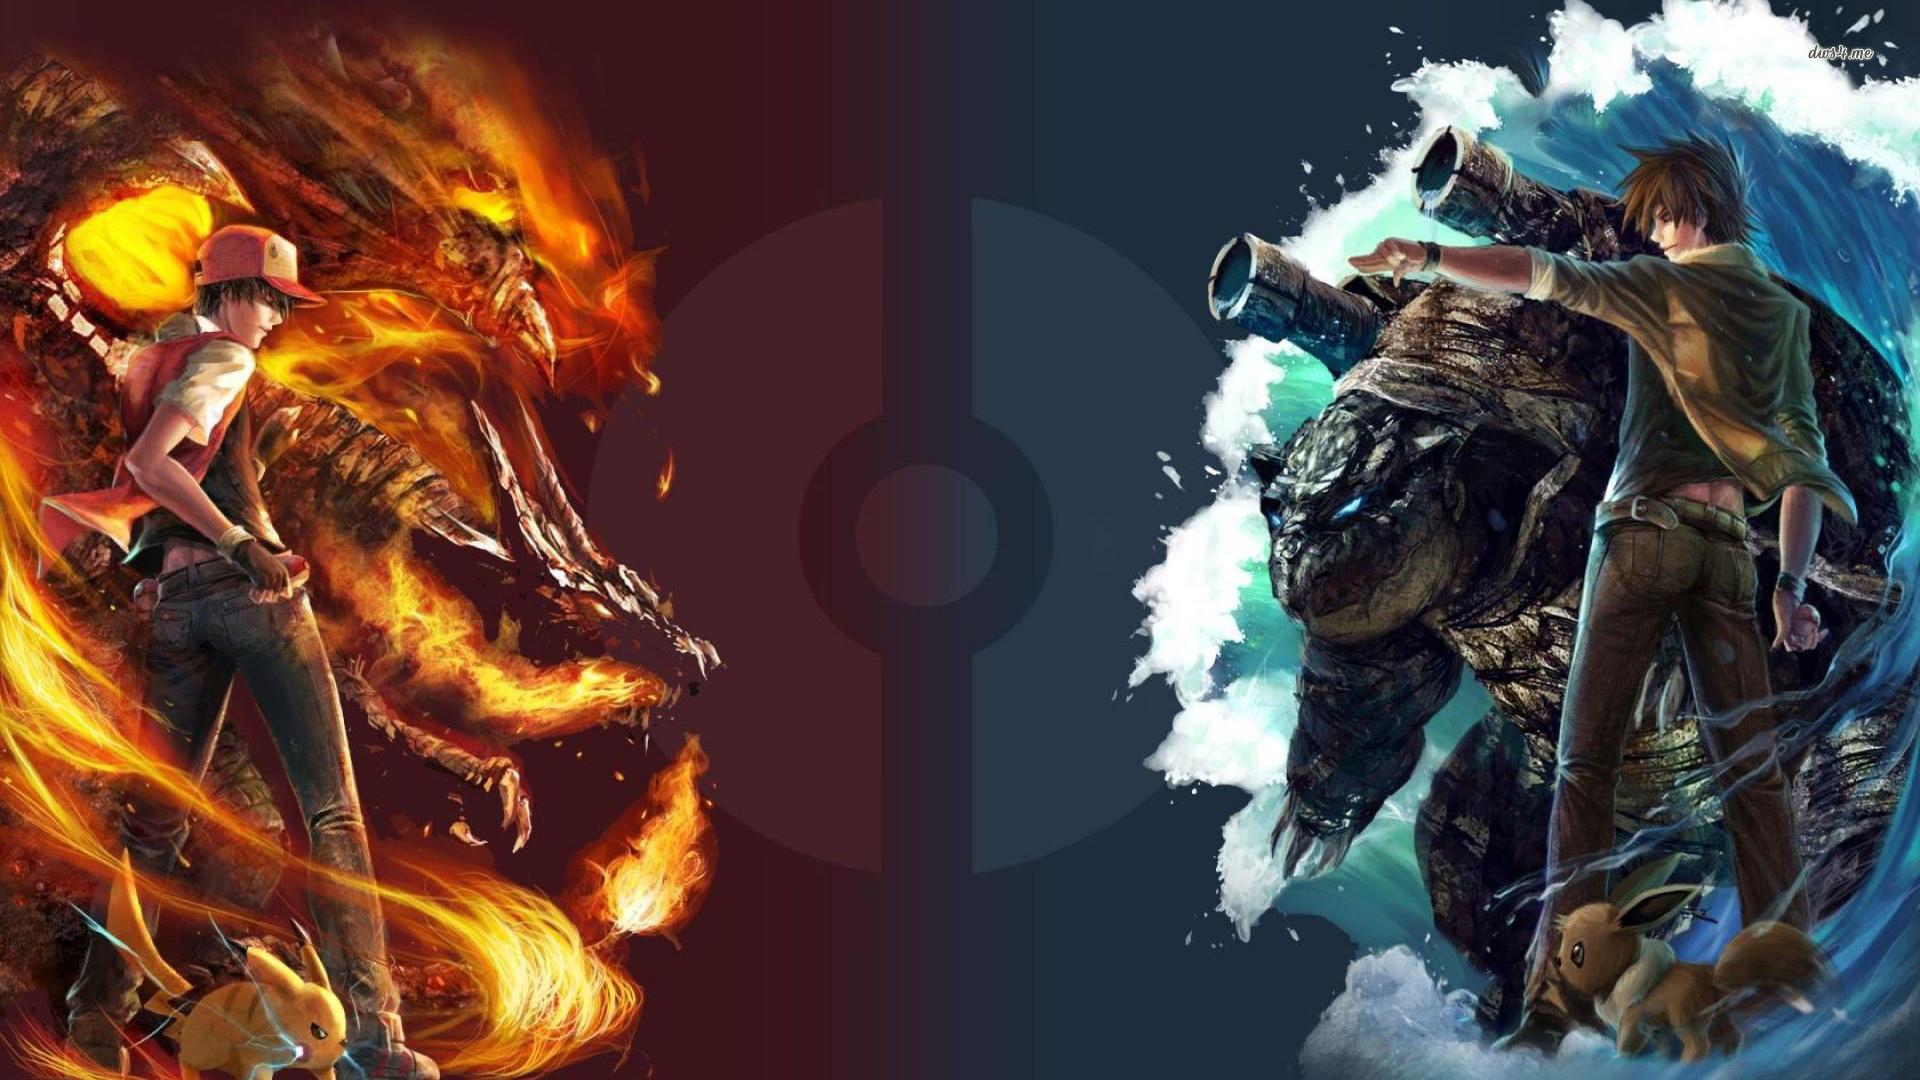 Pokemon Xy Mega Charizard Vs Mega Blastoise Prakard